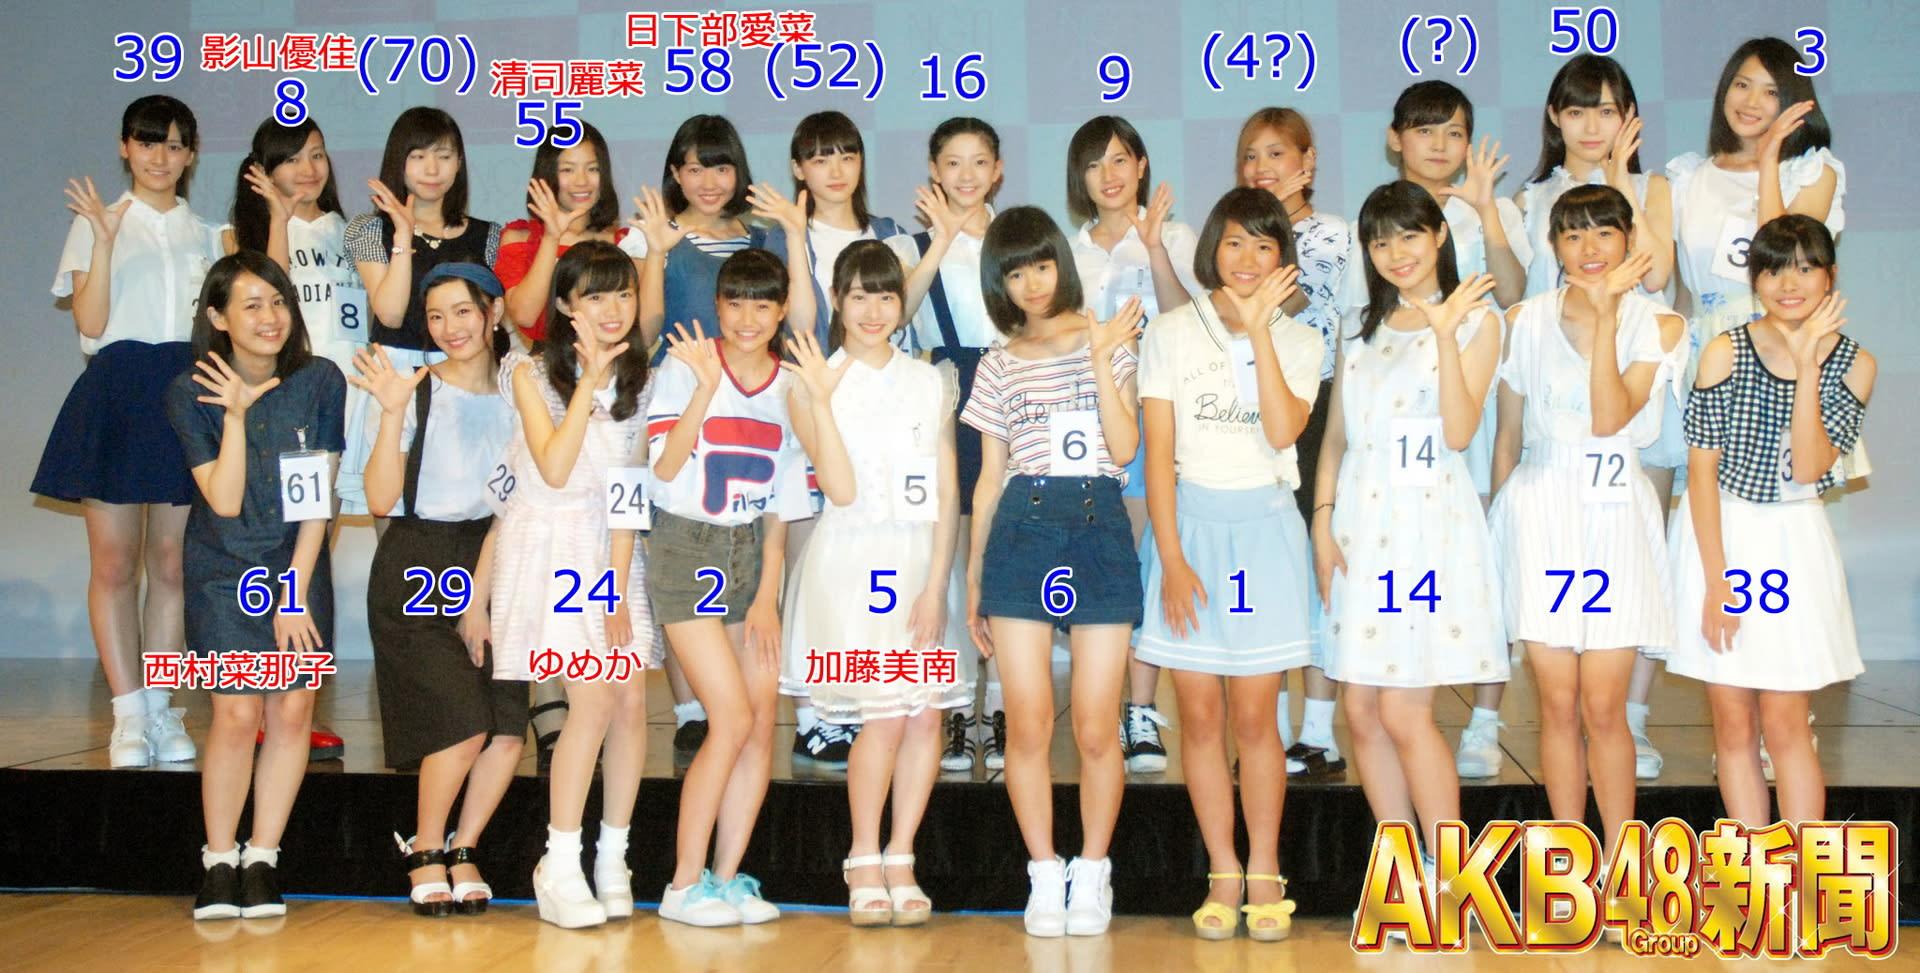 http://blogimg.goo.ne.jp/user_image/0e/ae/275481944a8fbbaf1387b811c2b1bd3d.jpg